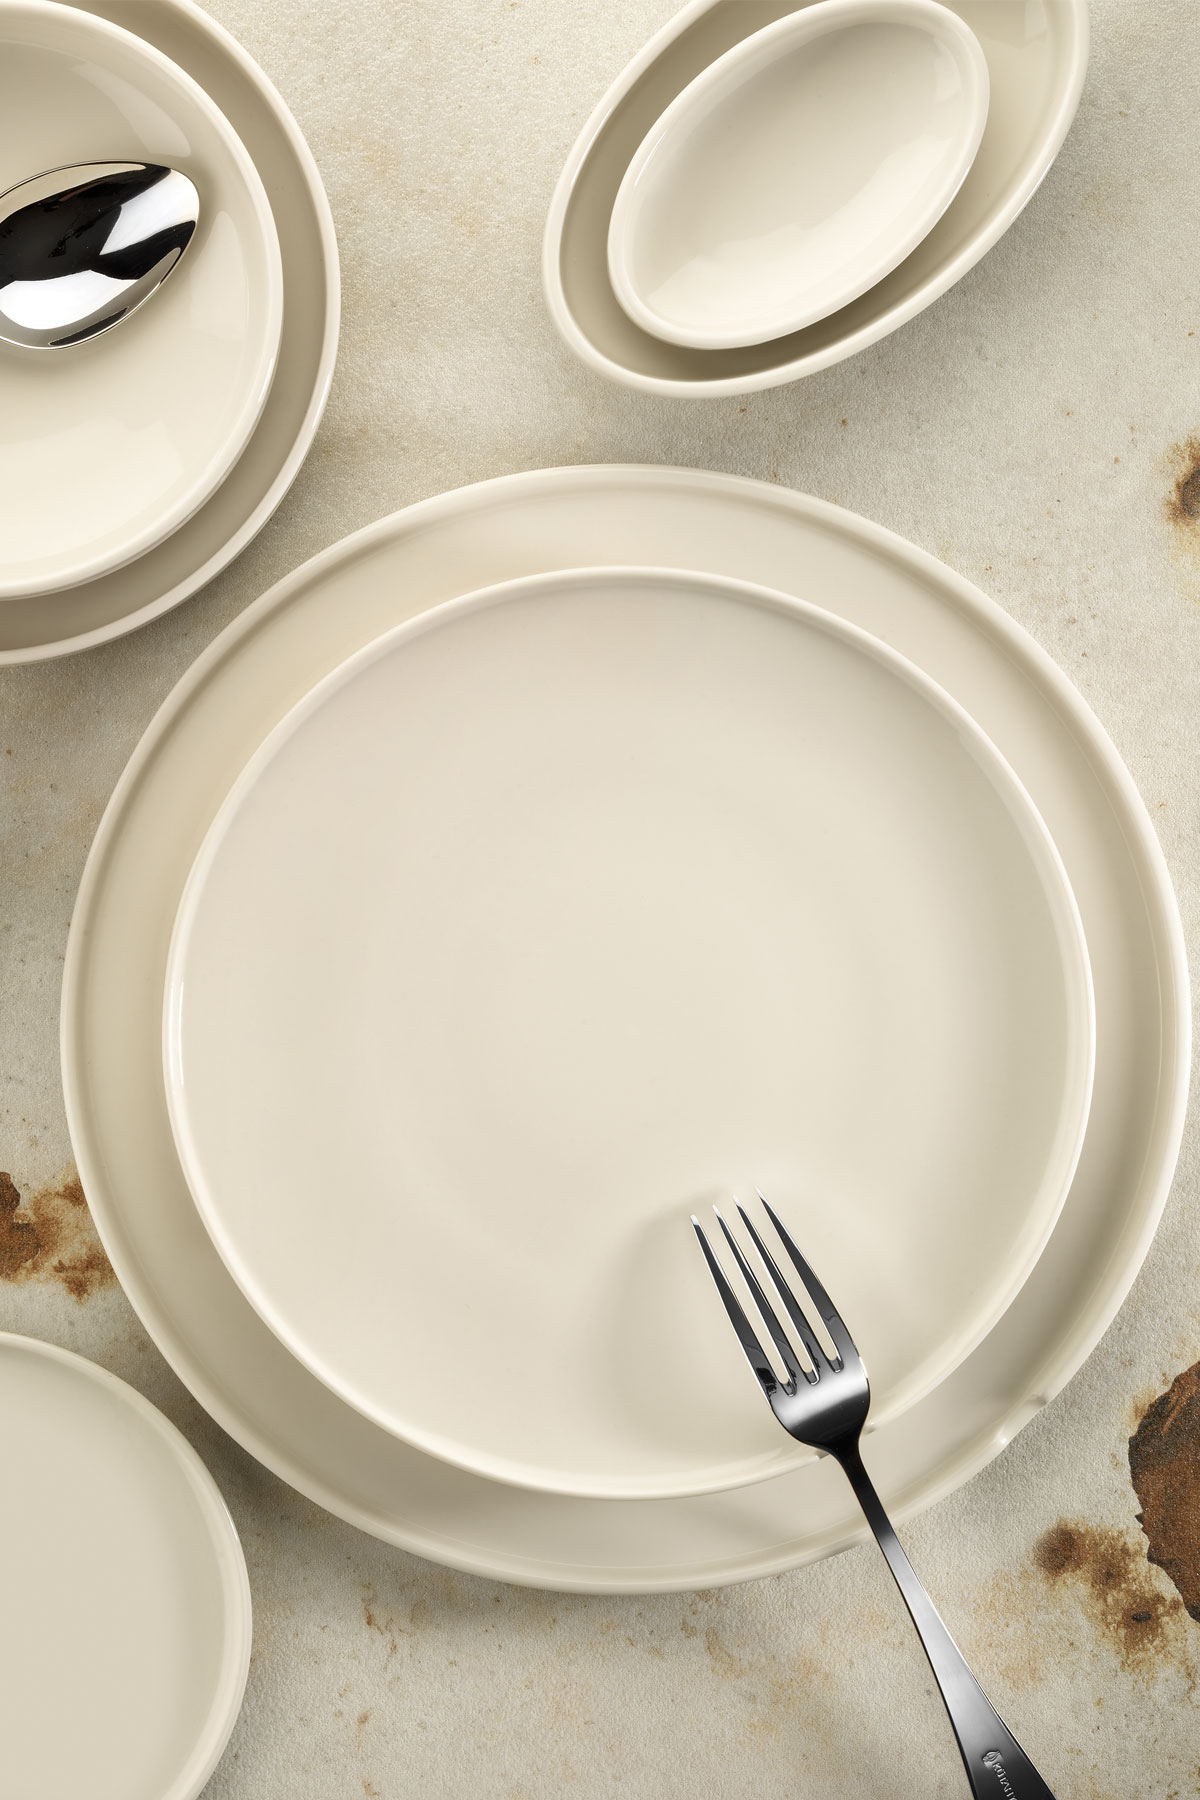 Kütahya Porselen Chef Taste Of 12 cm Oval Kase Krem